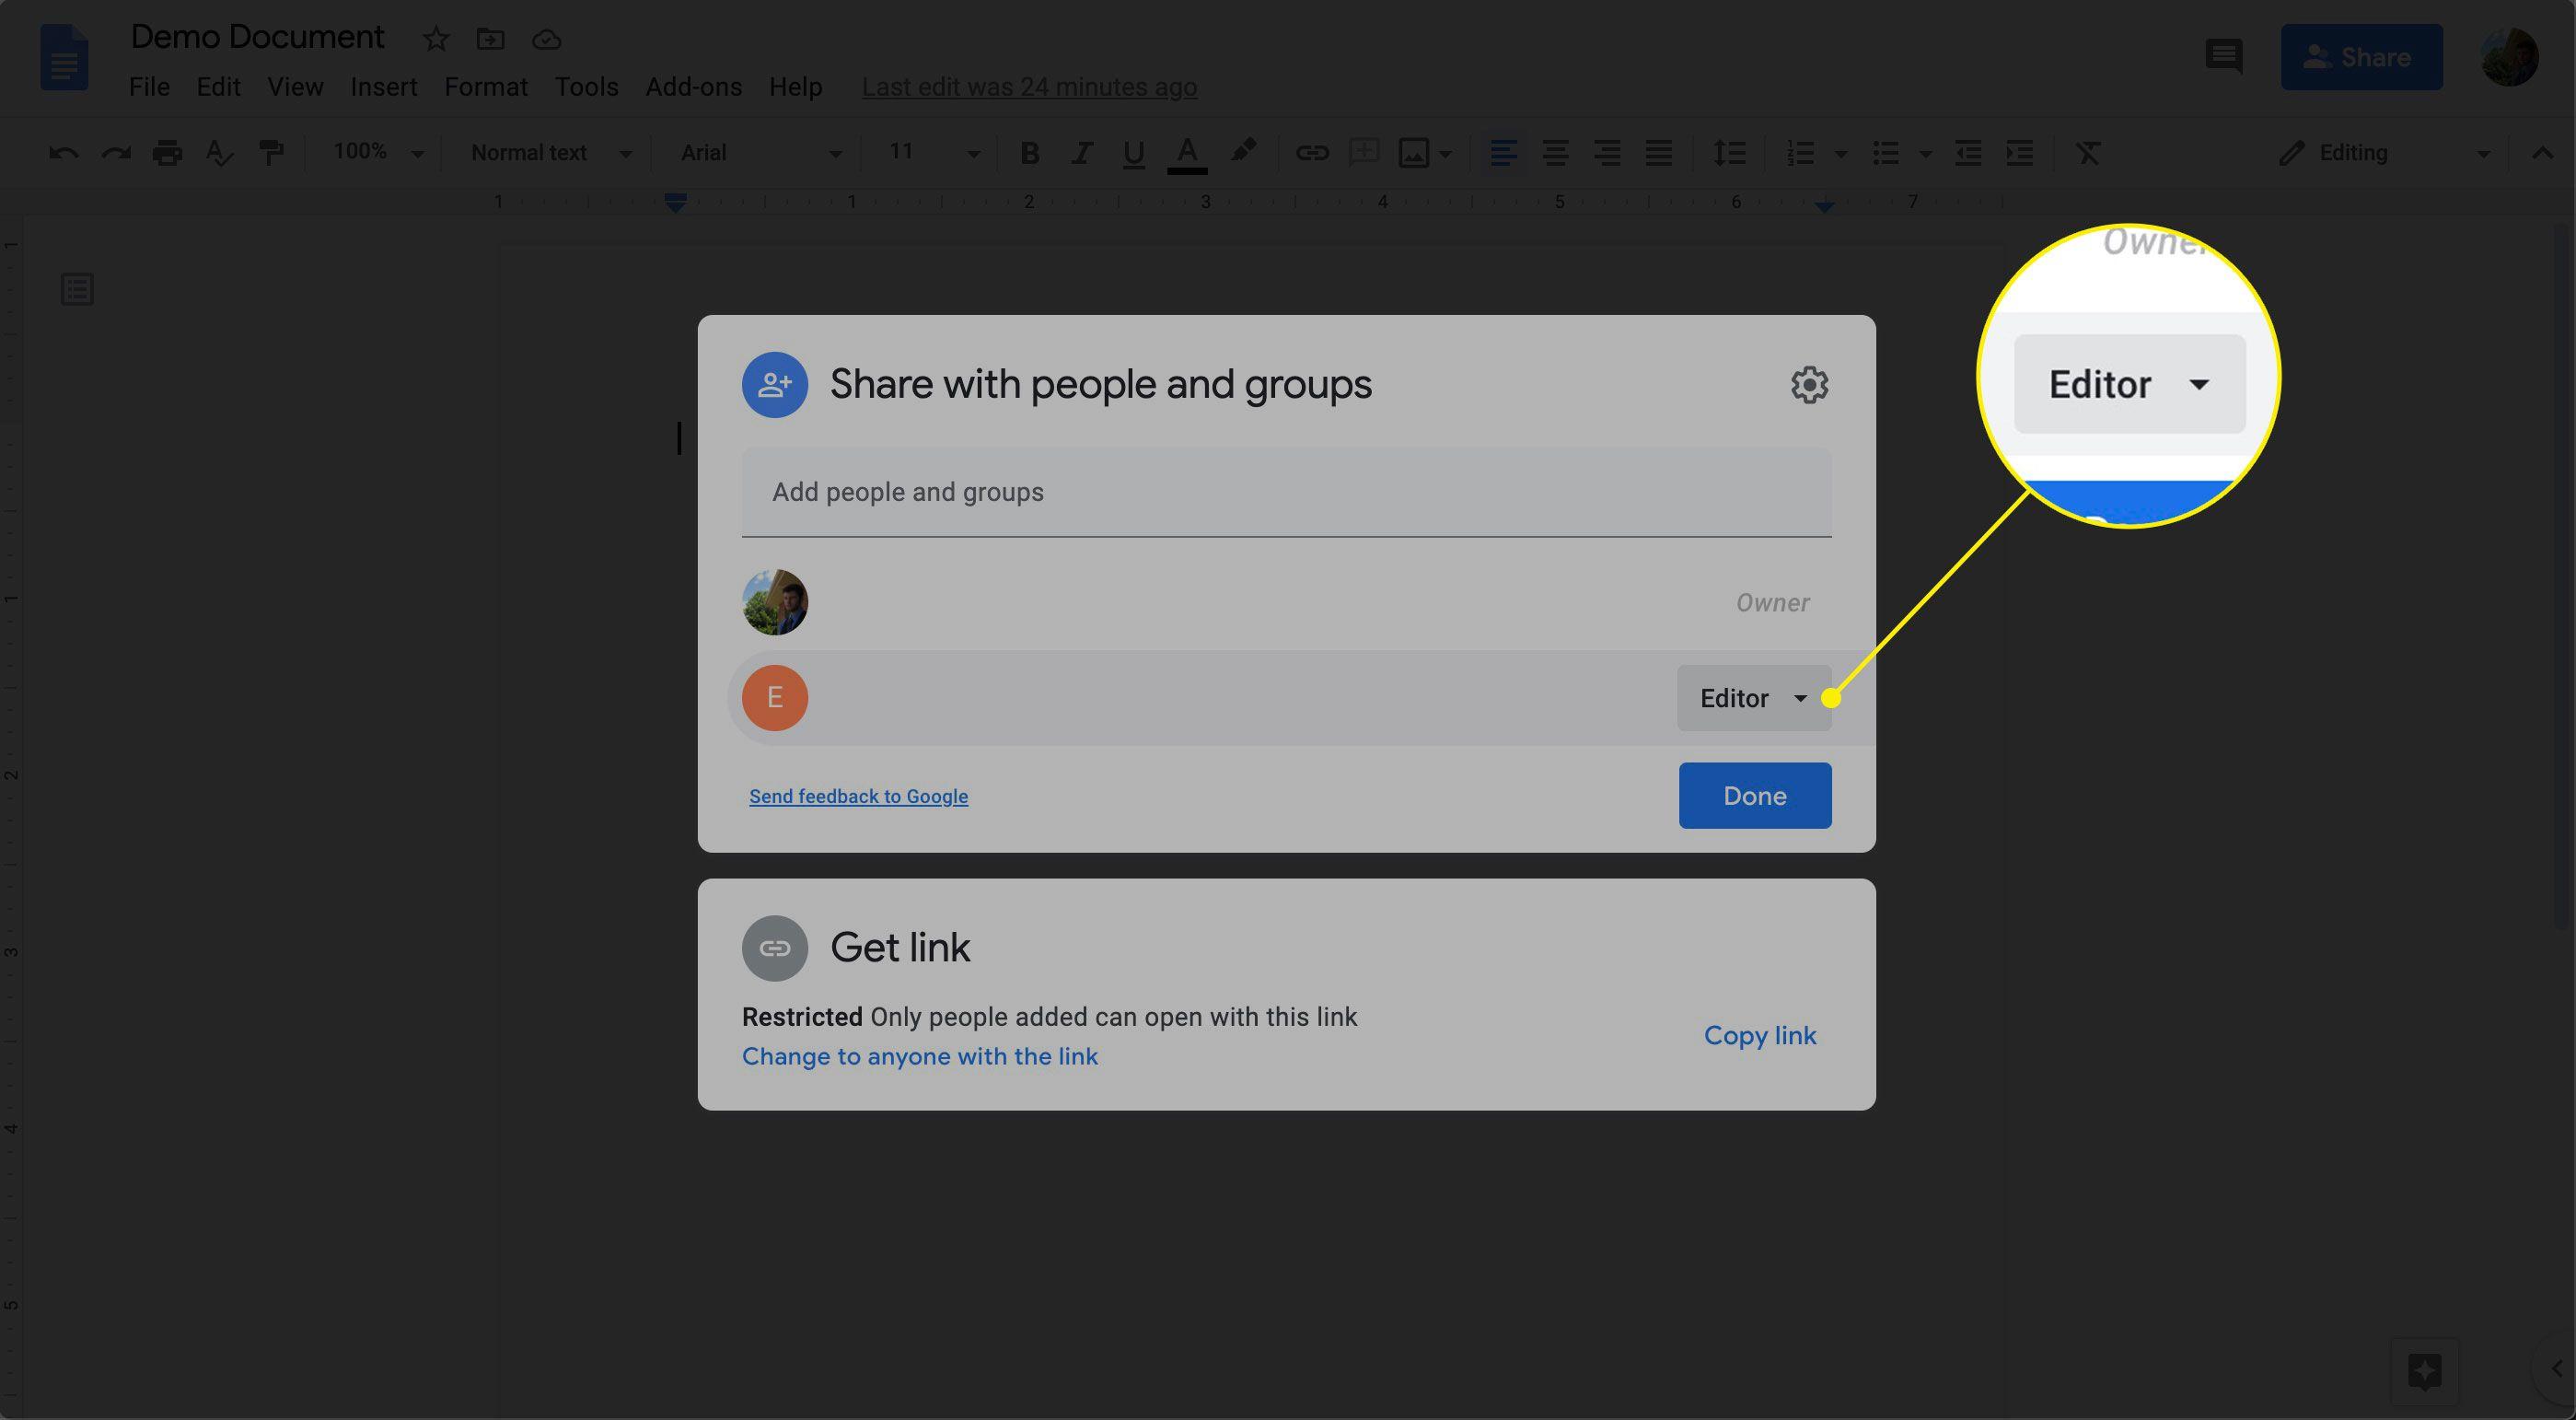 The collaborator menu in Google Docs